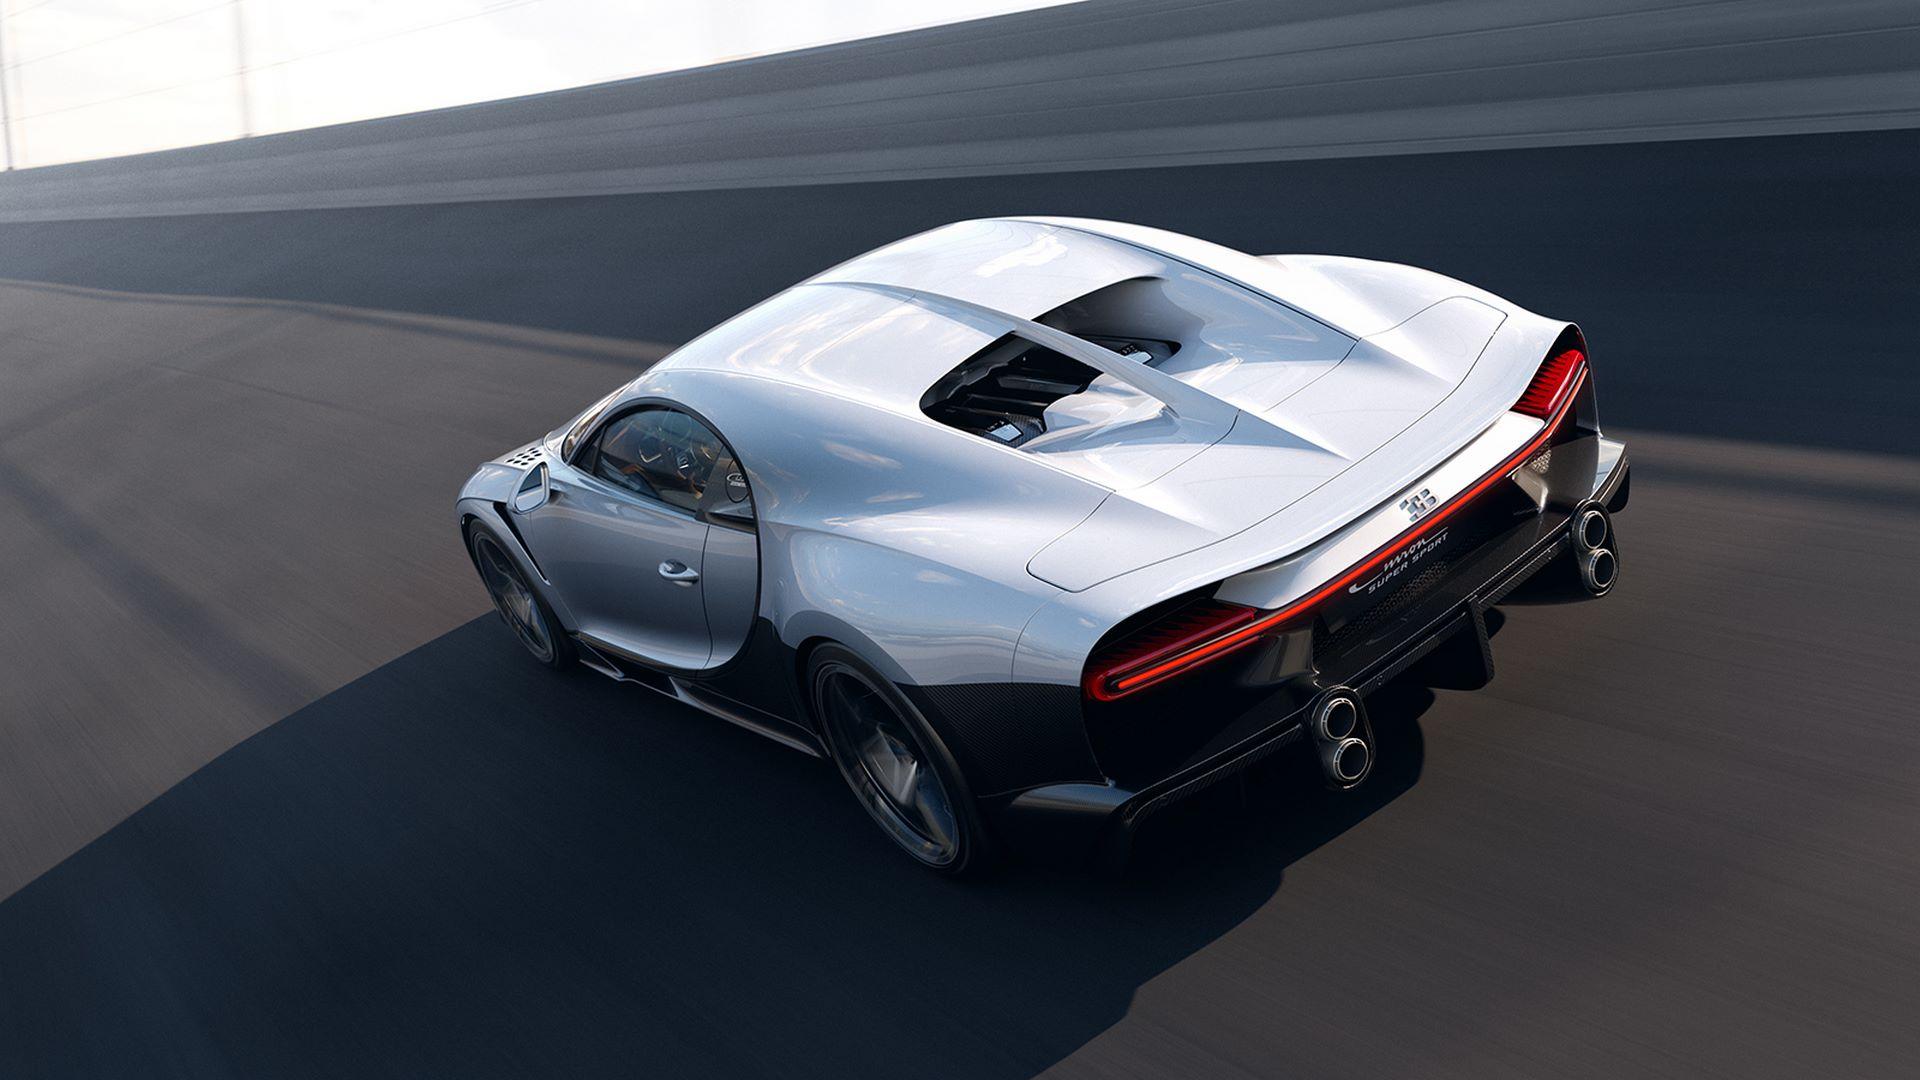 02_08_bugatti_chiron_super_sport_high_speed_rear